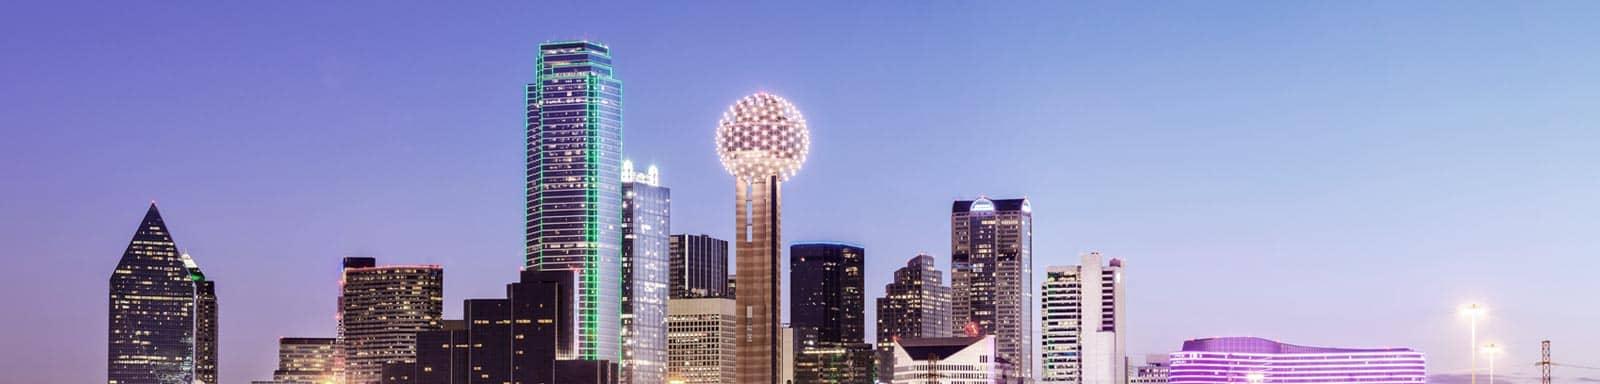 Dallas Skyline Image